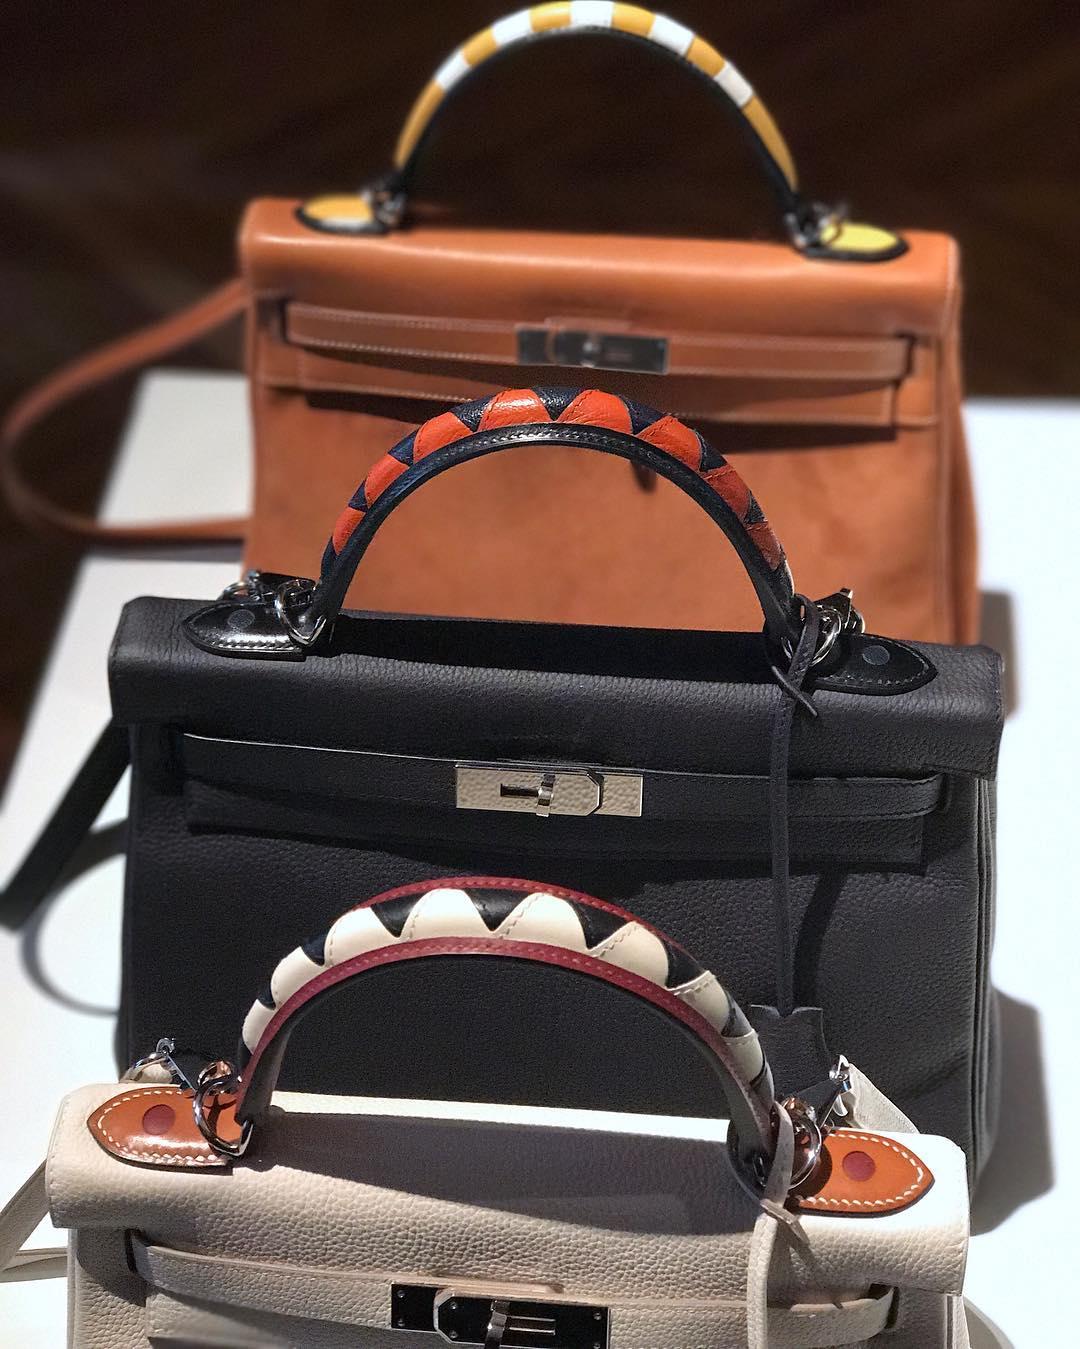 c92ef10003 Hermes Birkin Bag Colors 2017